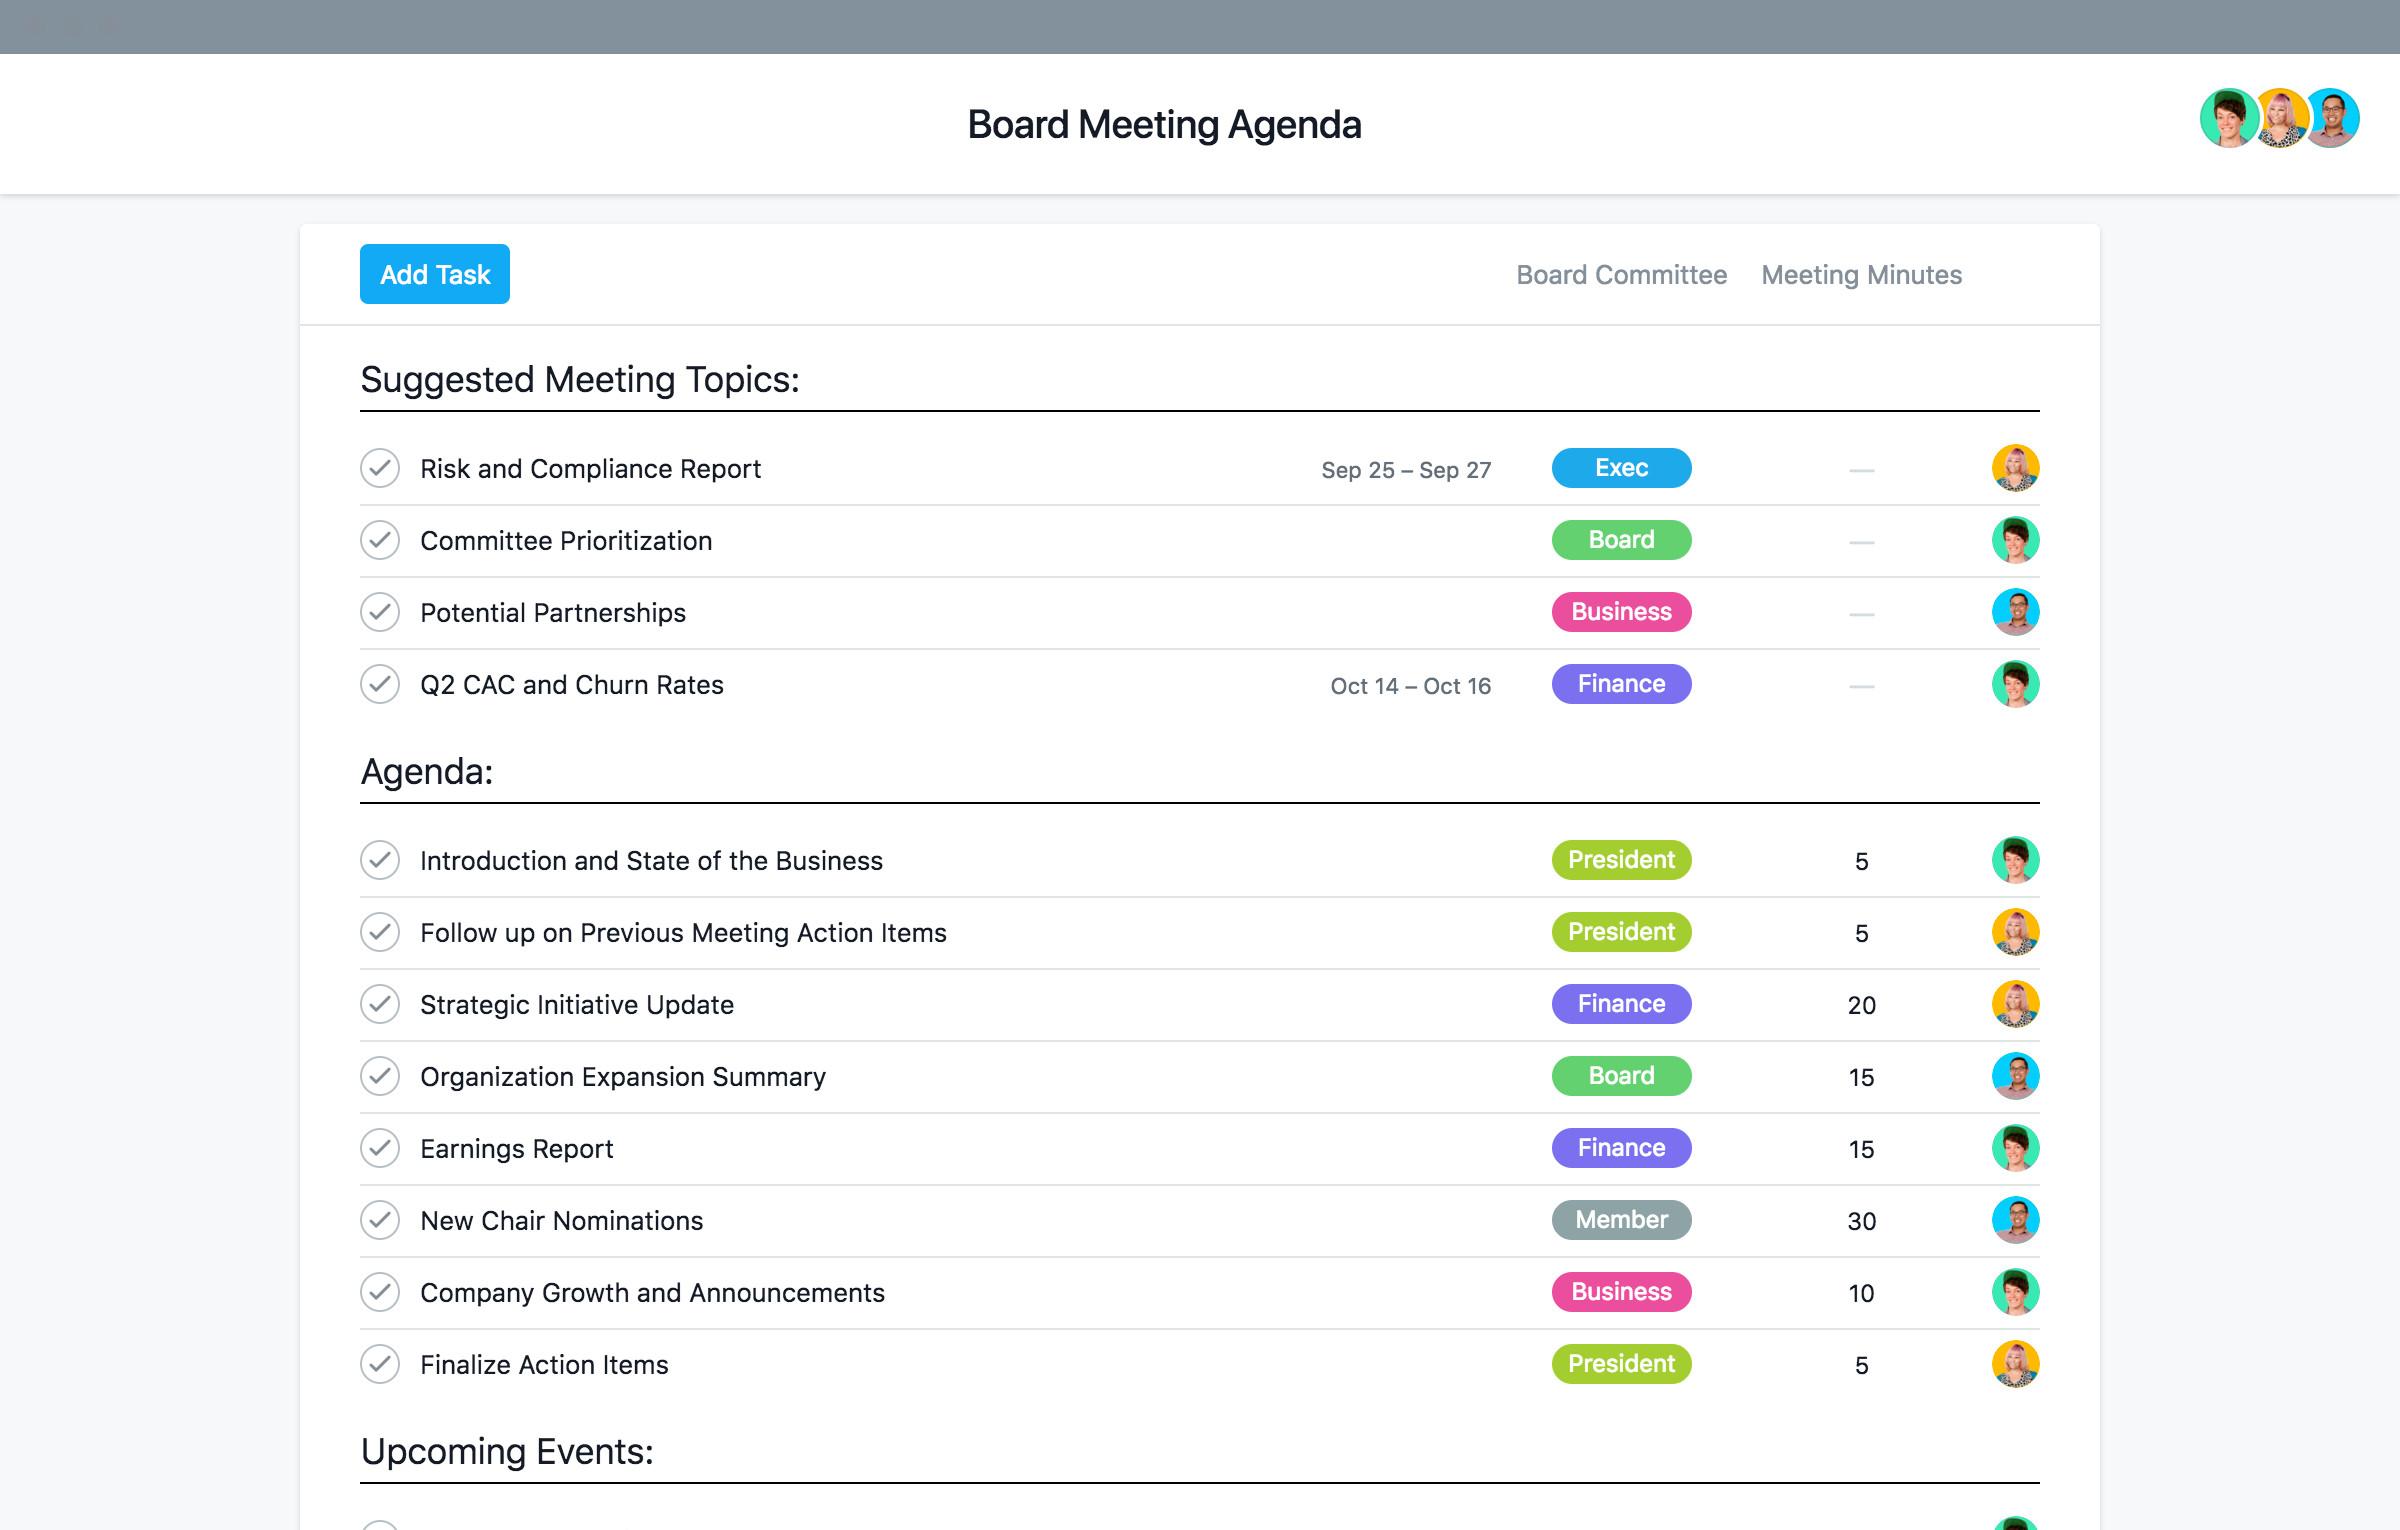 Nonprofit Board Meeting Agenda Template Nonprofit Board Meeting Agenda Template and Best Practices